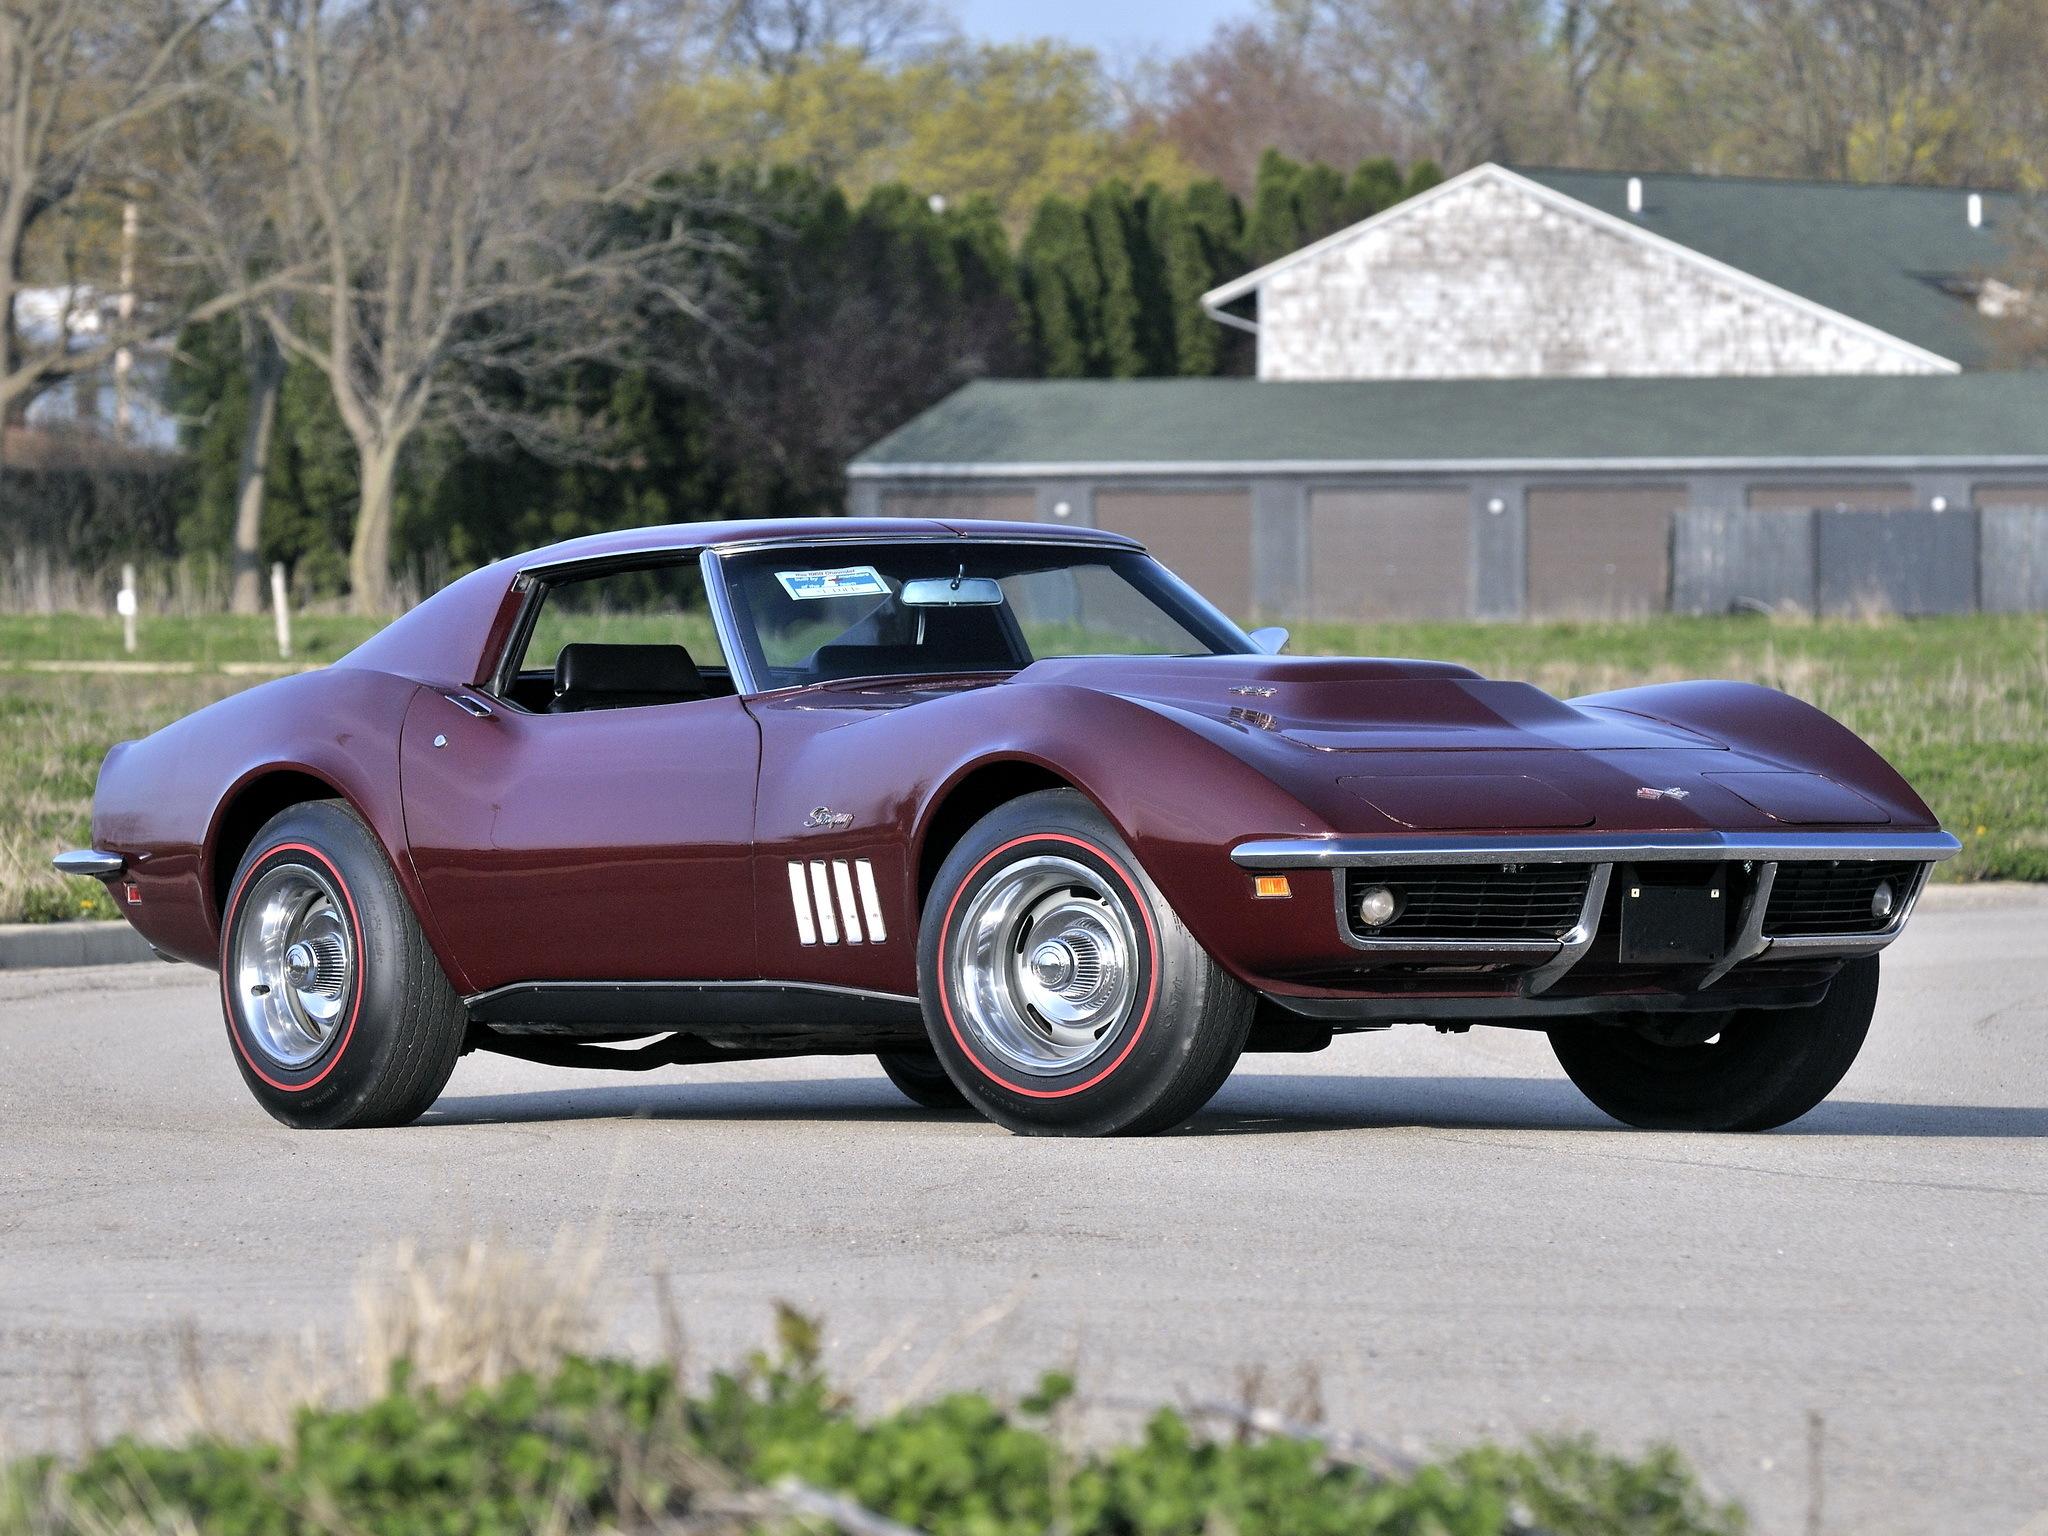 127543 скачать обои Тачки (Cars), Шевроле (Chevrolet), Corvette, Stingray, C3, 1969, L88 427 Coupe - заставки и картинки бесплатно